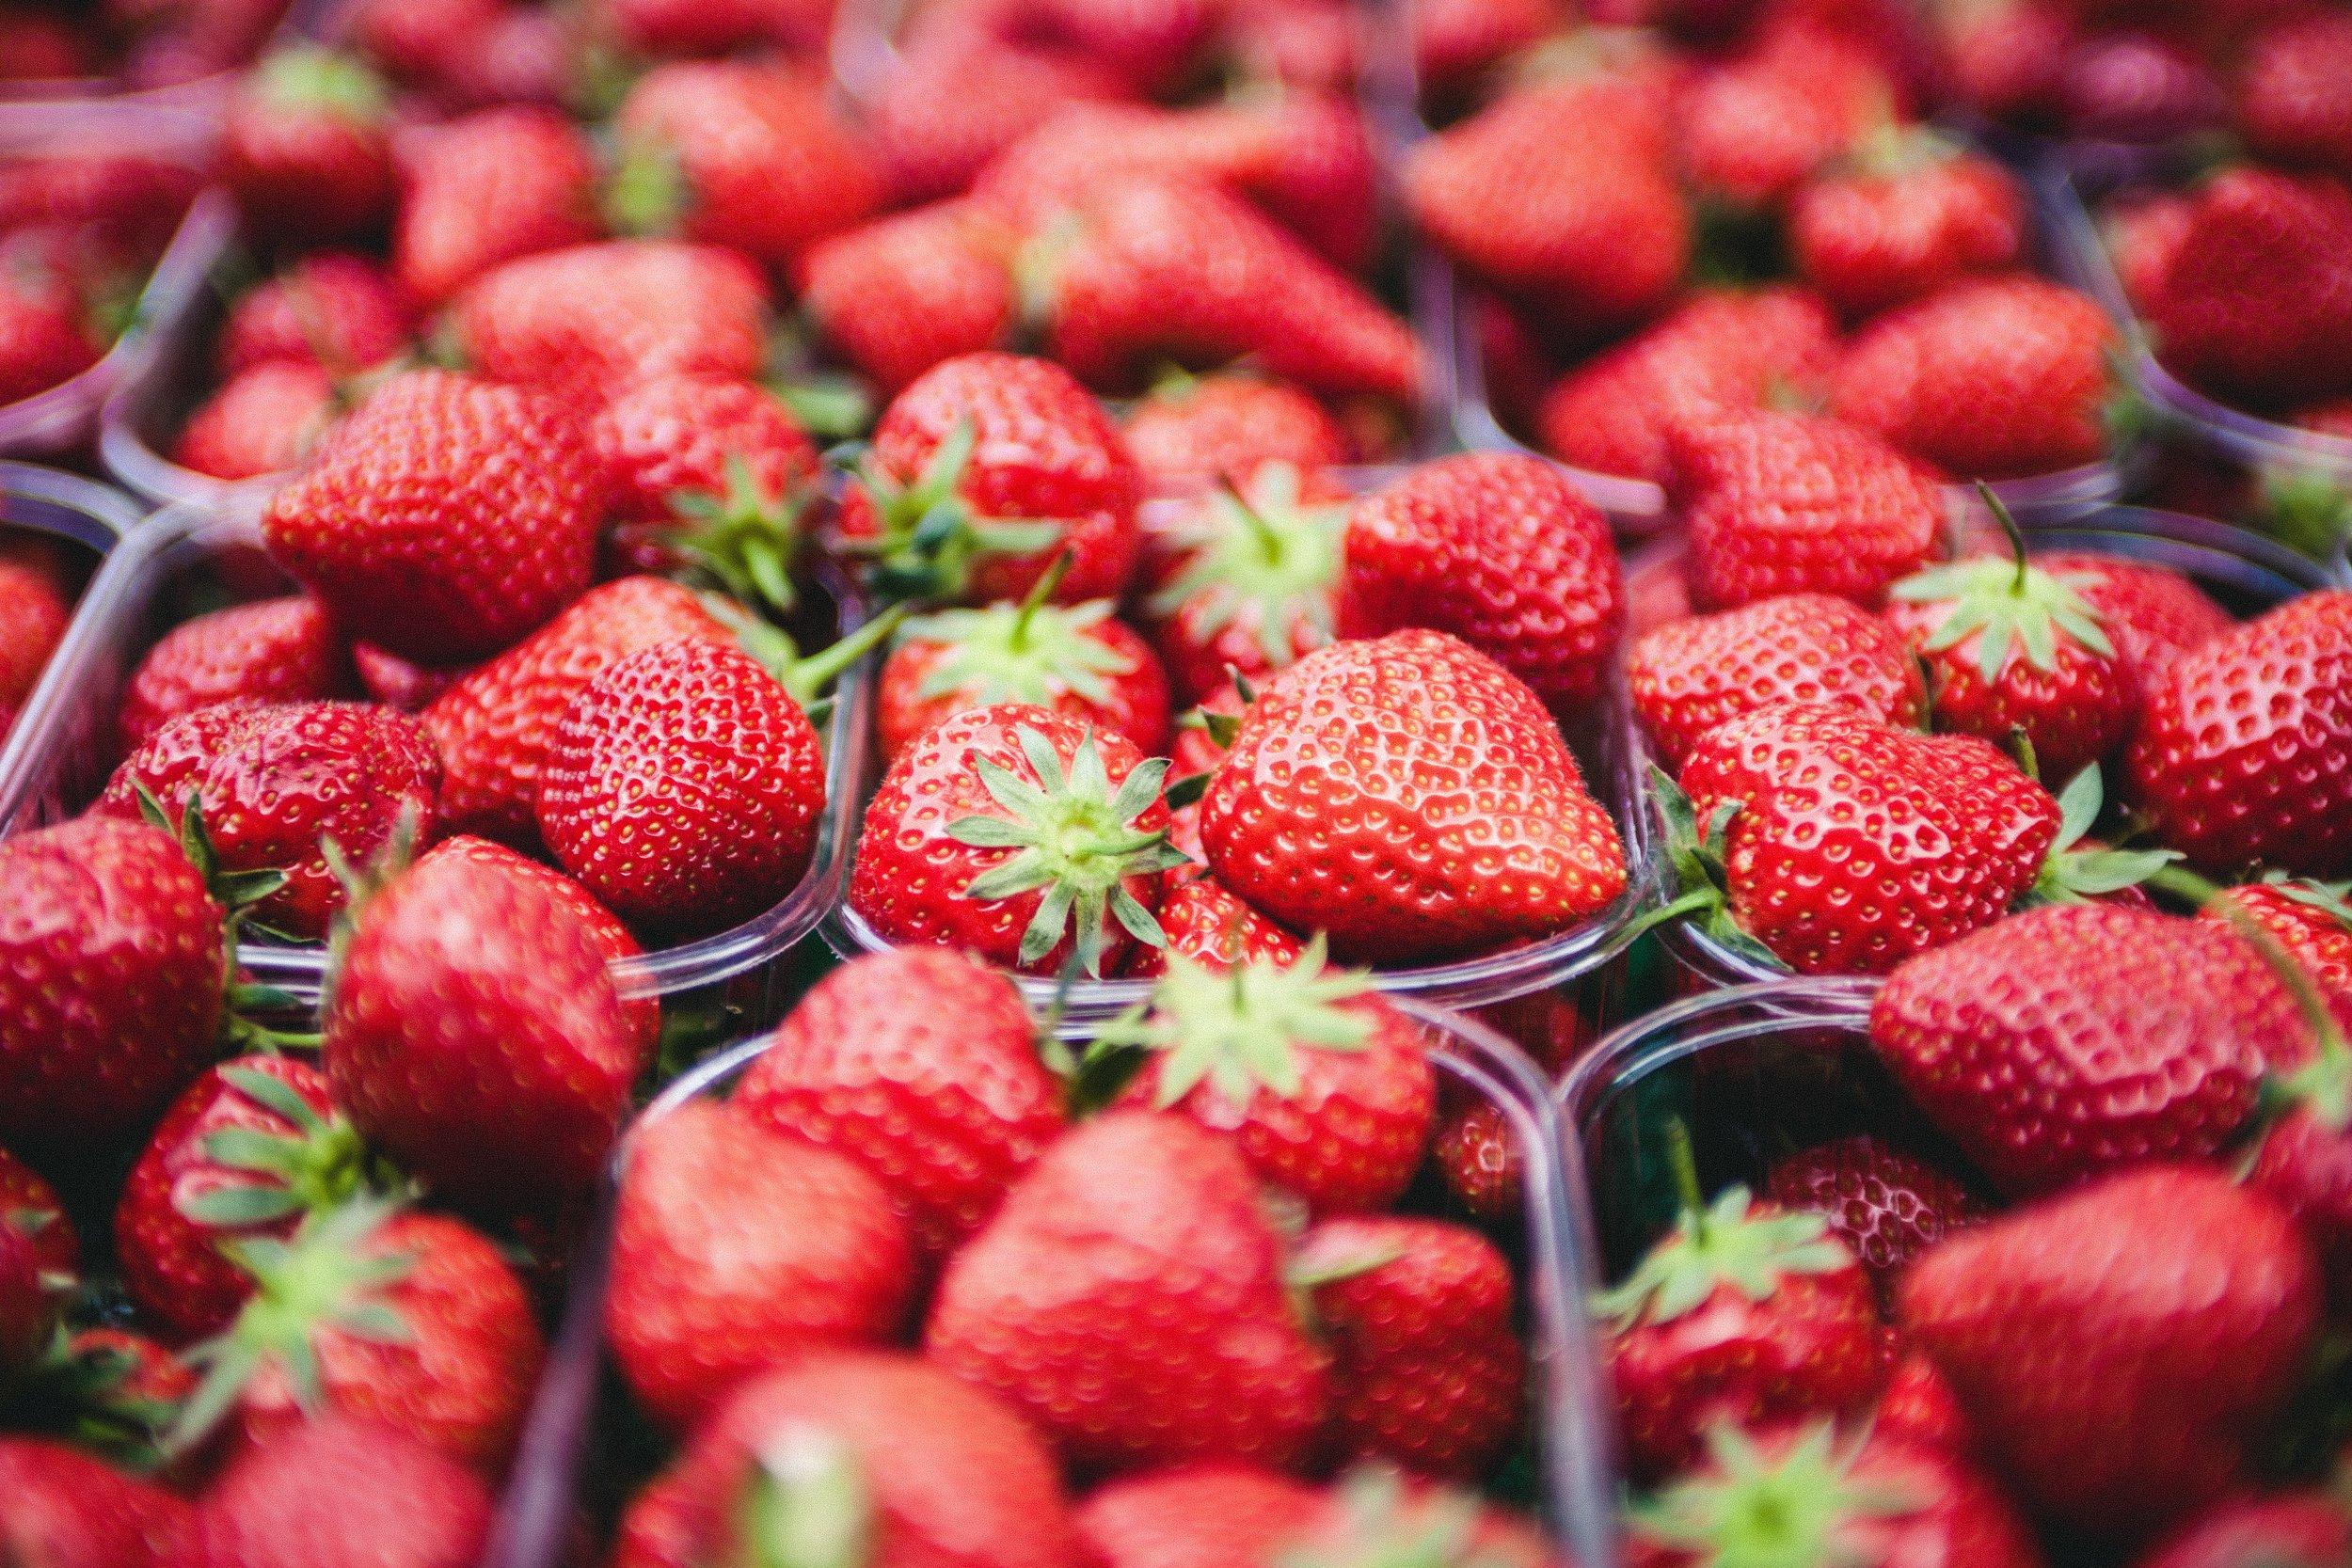 berries-blur-blurry-175728.jpg